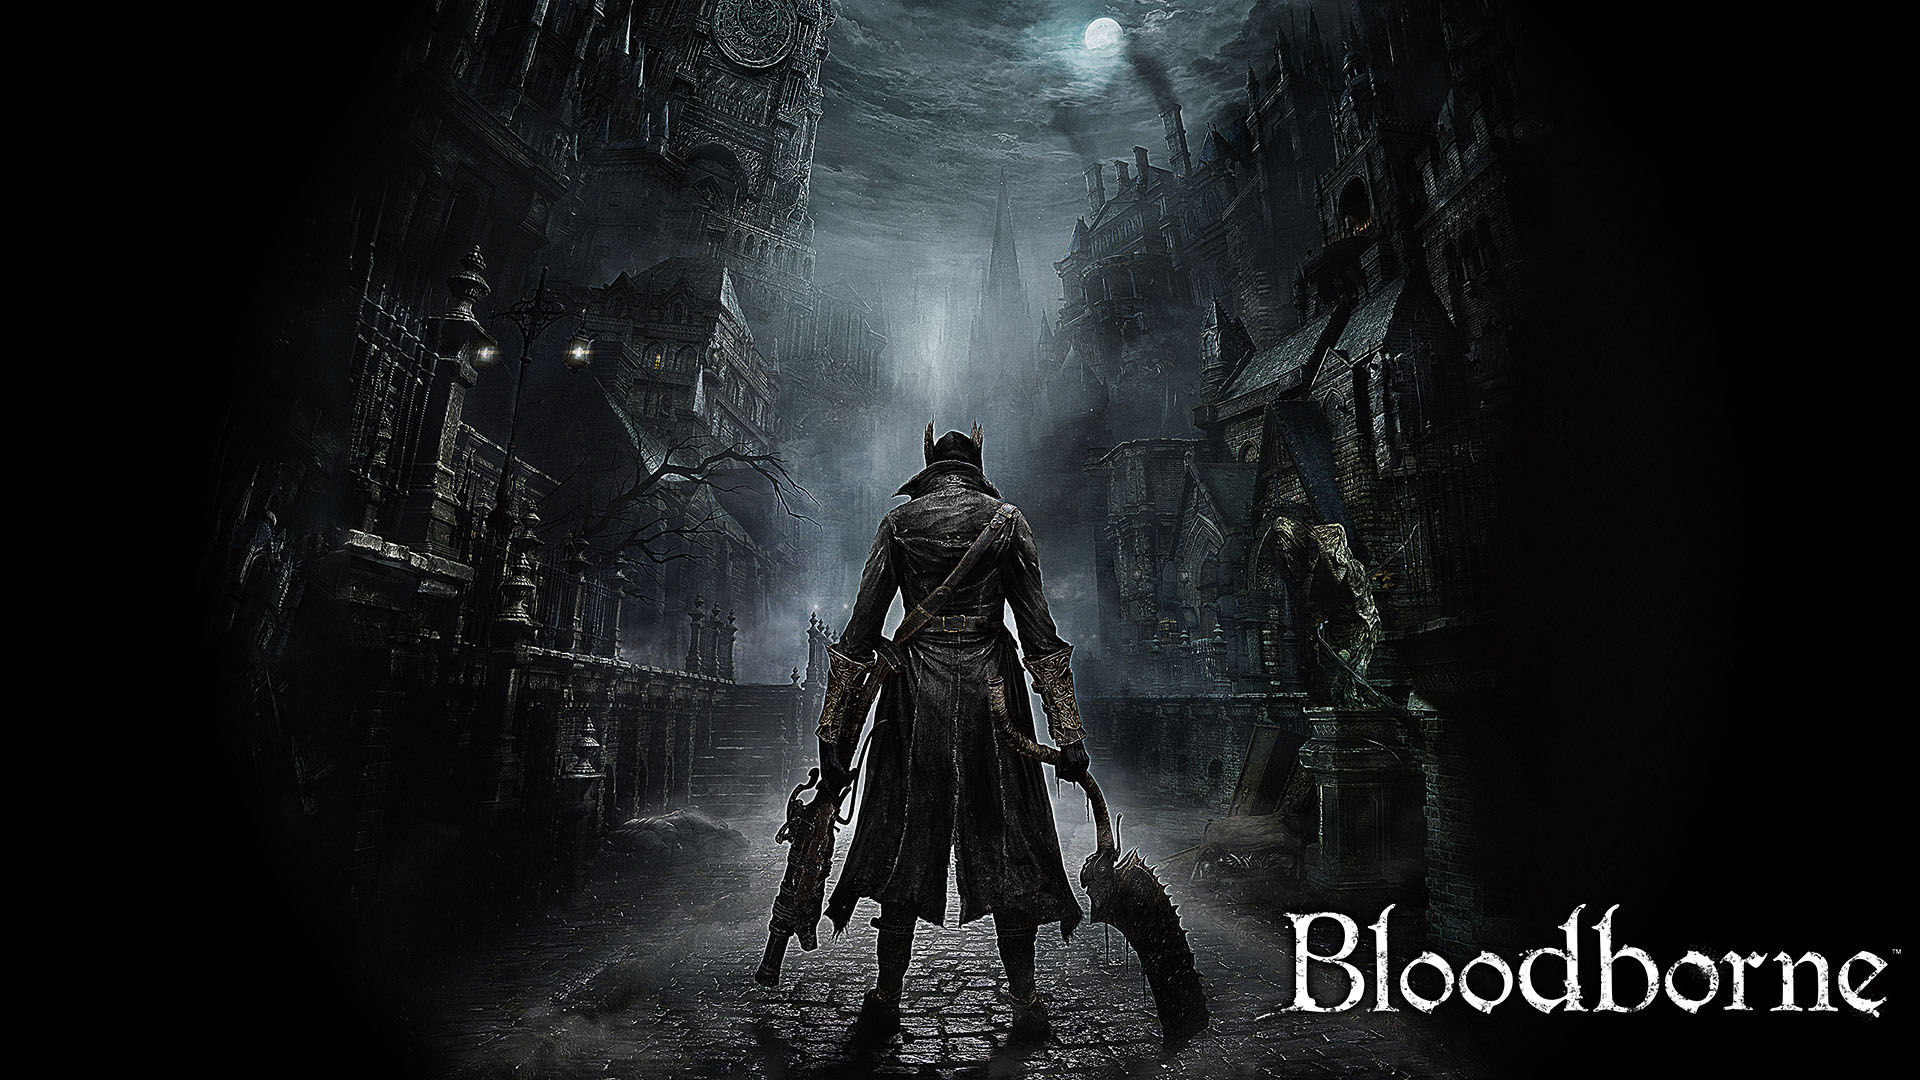 3092 - ¿Cuánto sabes de Bloodborne?